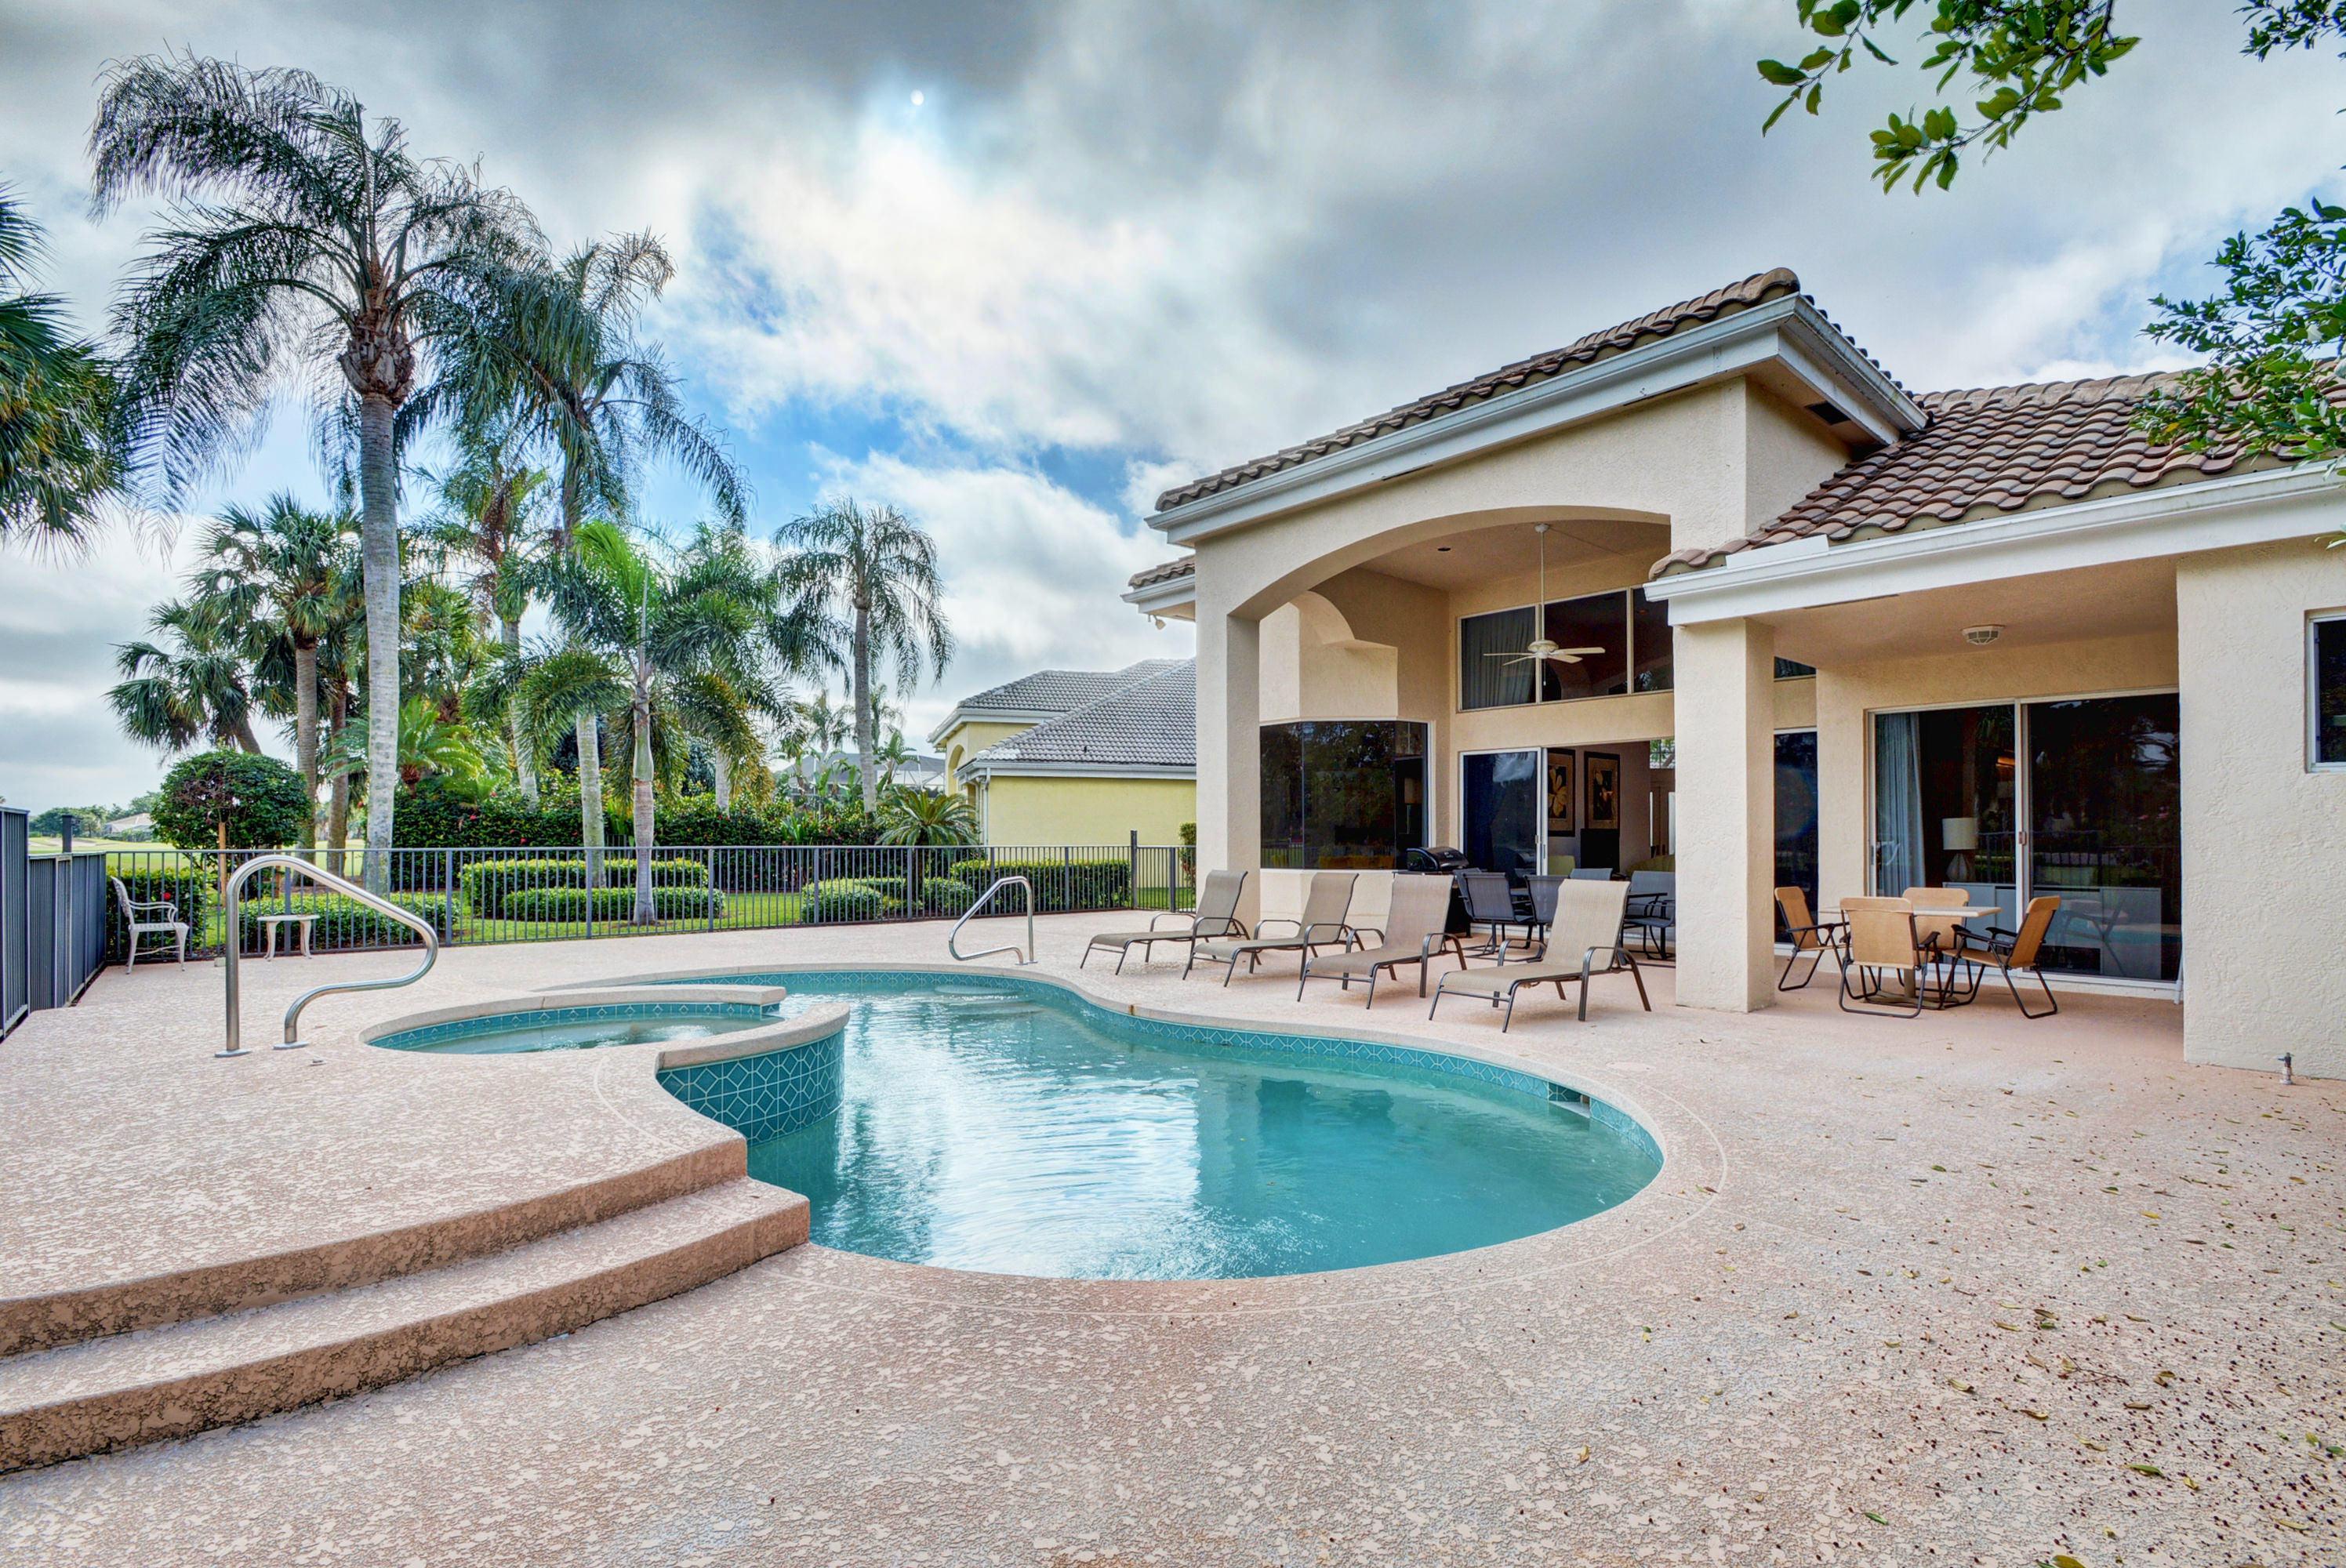 Home for sale in Ballenisles Windward Palm Beach Gardens Florida